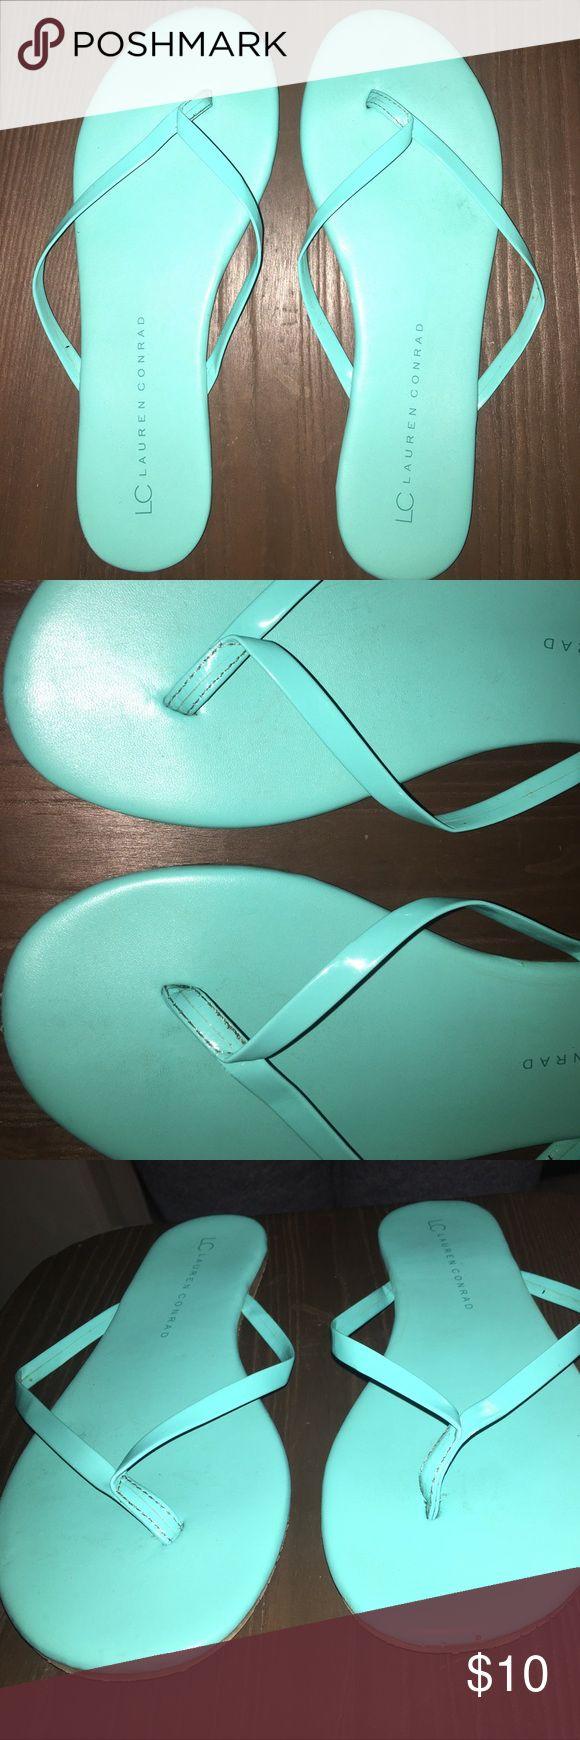 [LC Lauren Conrad] Blue Flip Flops Good condition with some minor wear. Size 8.  Kind of a Tiffany blue color. LC Lauren Conrad Shoes Sandals